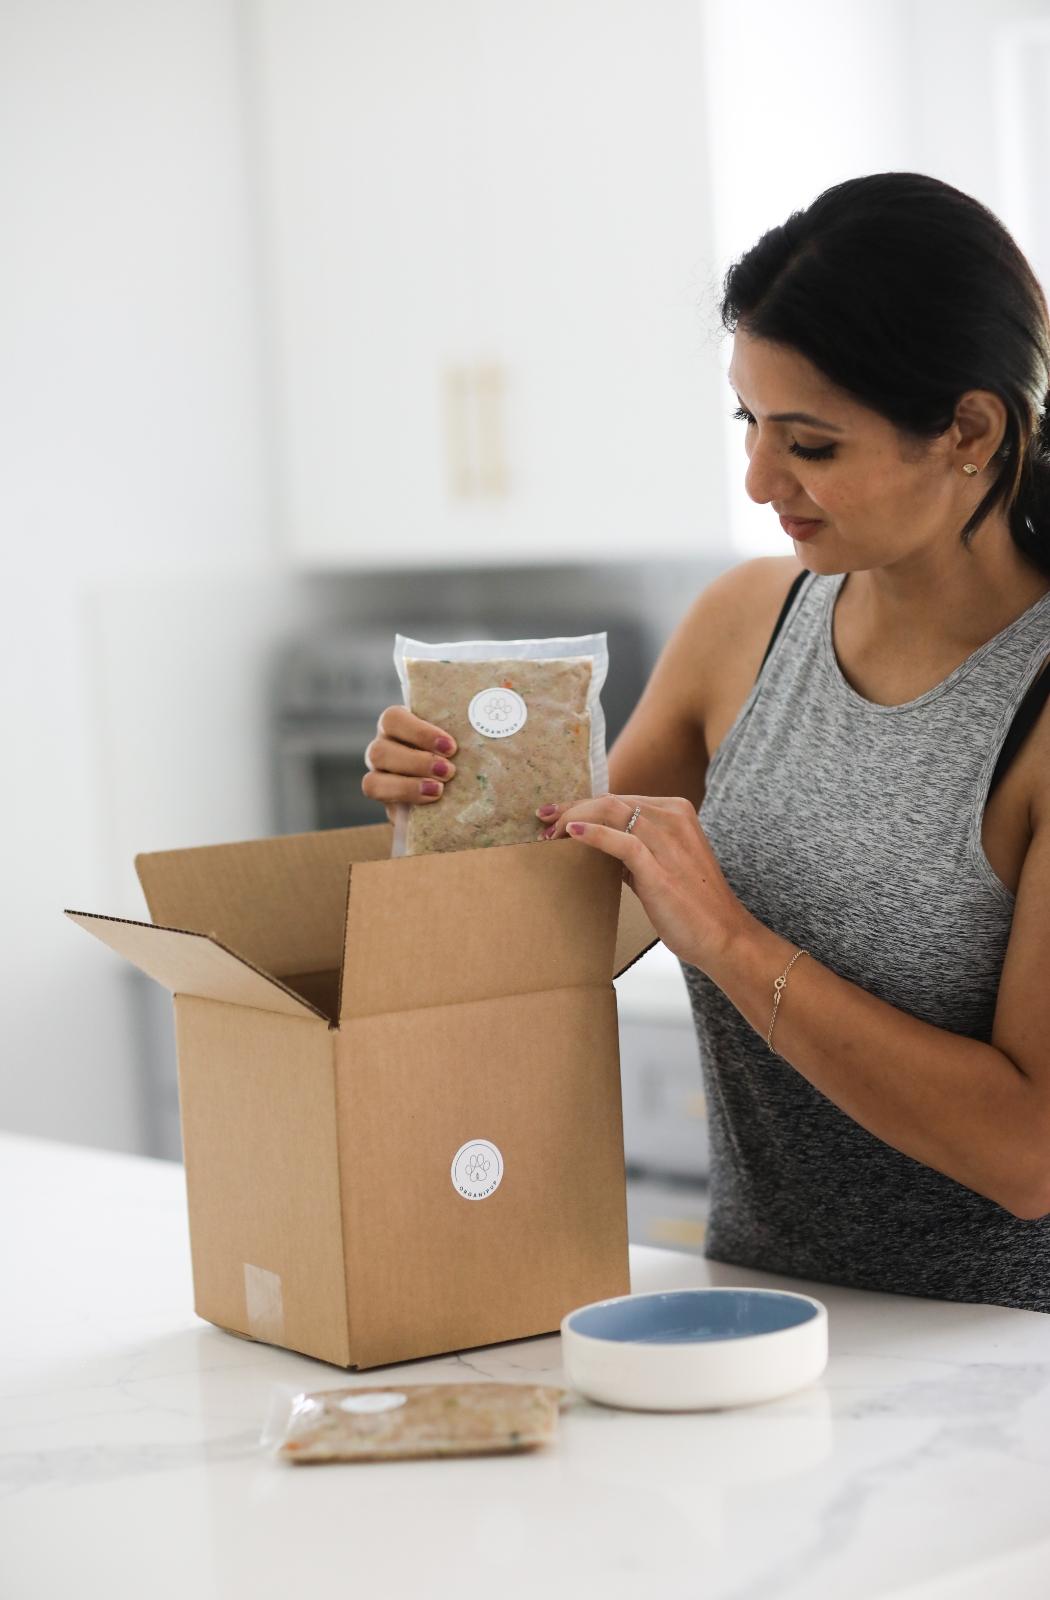 Organipup: Fresh, Organic, Human-Grade Dog Food